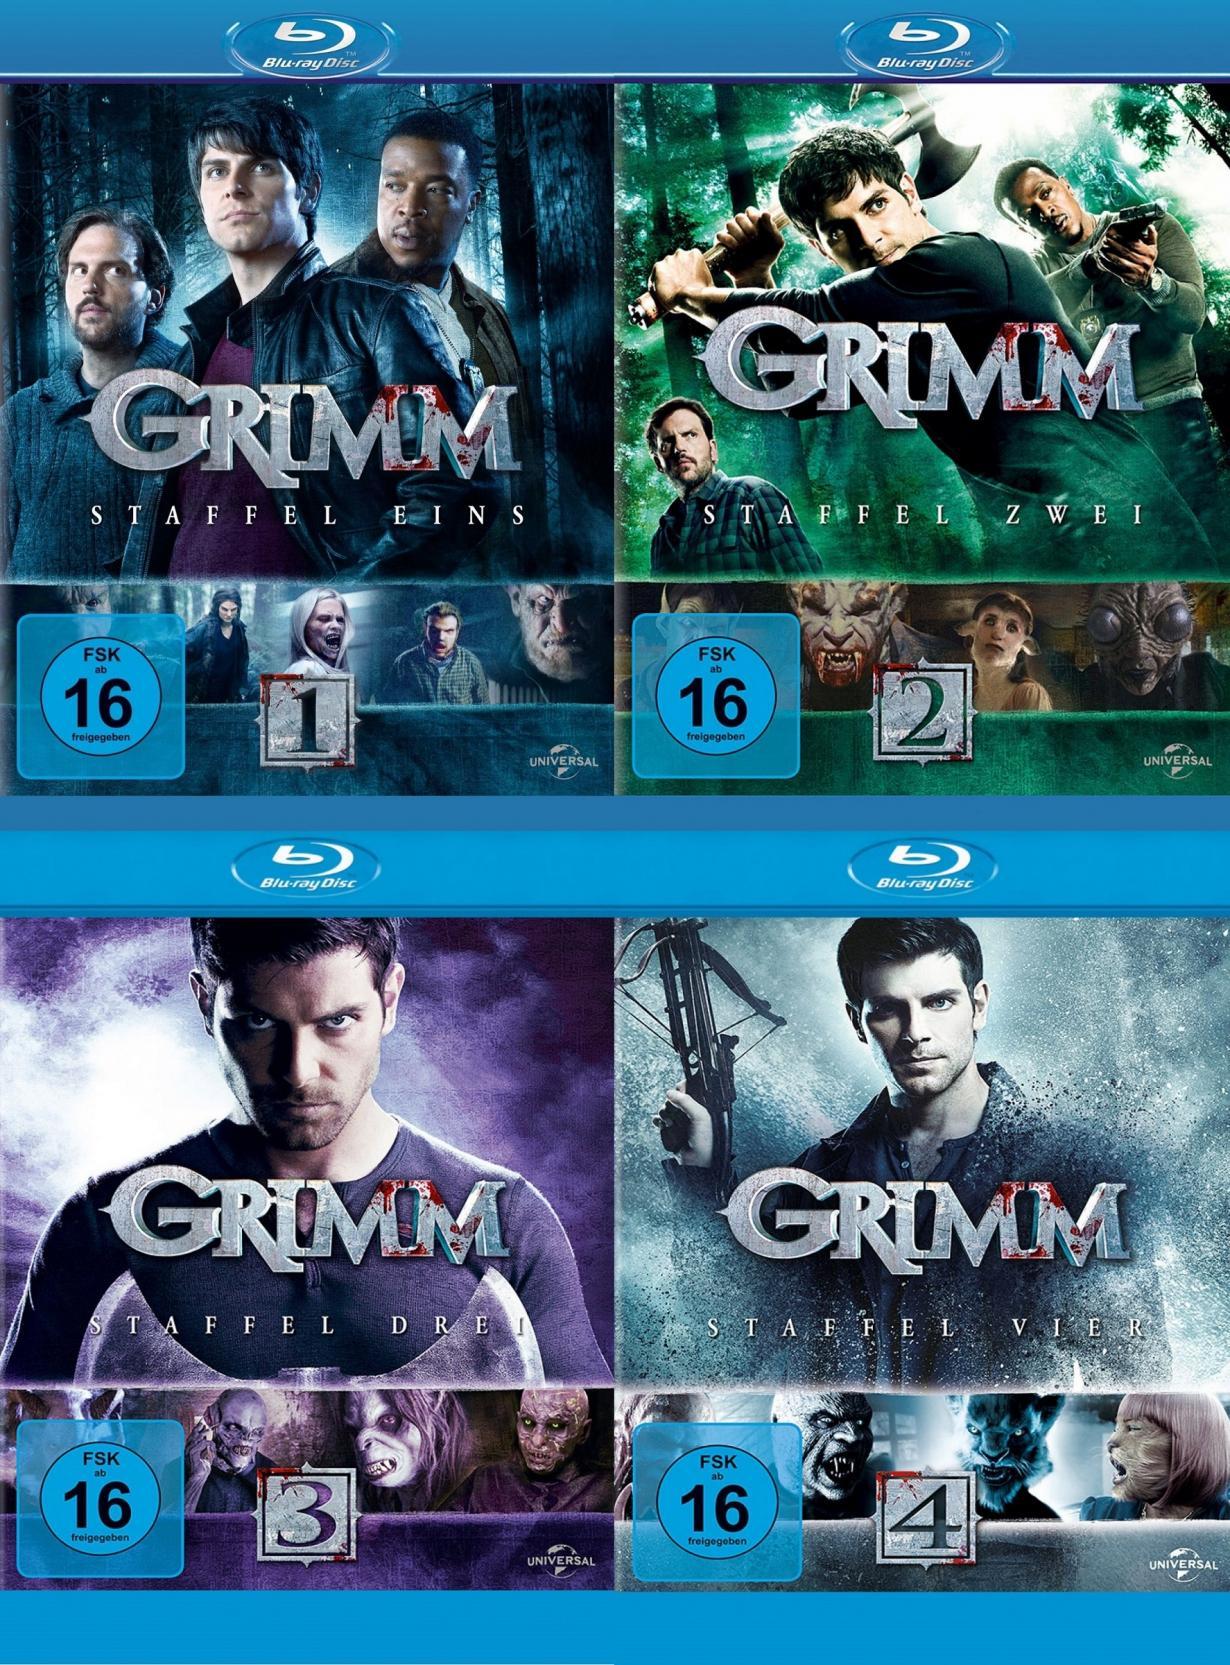 Grimm Staffel 1-4 Set (Blu-ray)